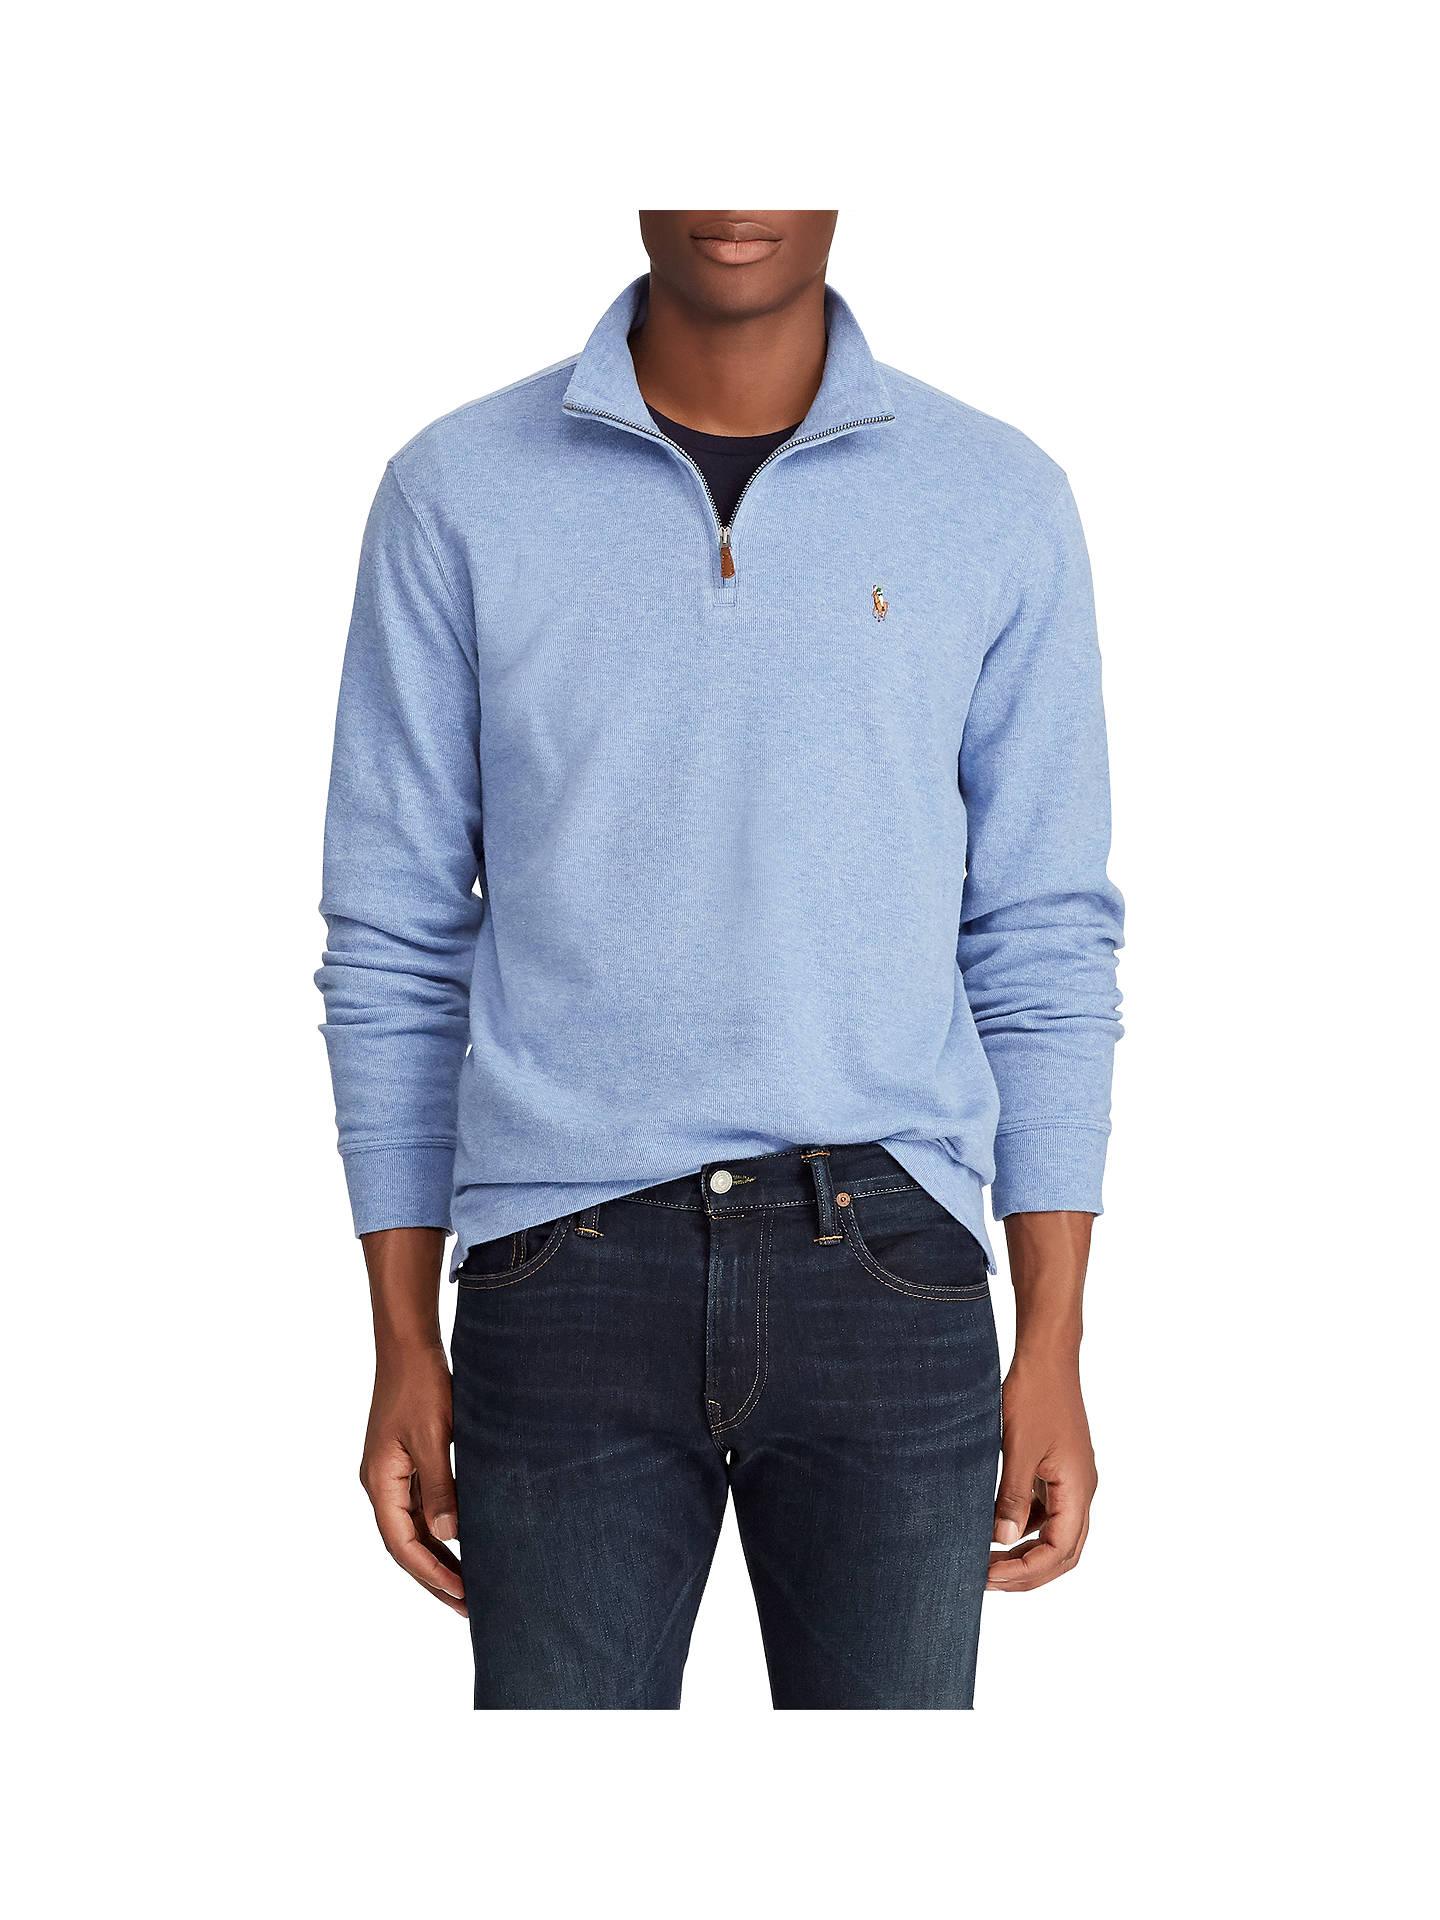 47a0bb7e2 Buy Polo Ralph Lauren Pima Half Zip Pullover